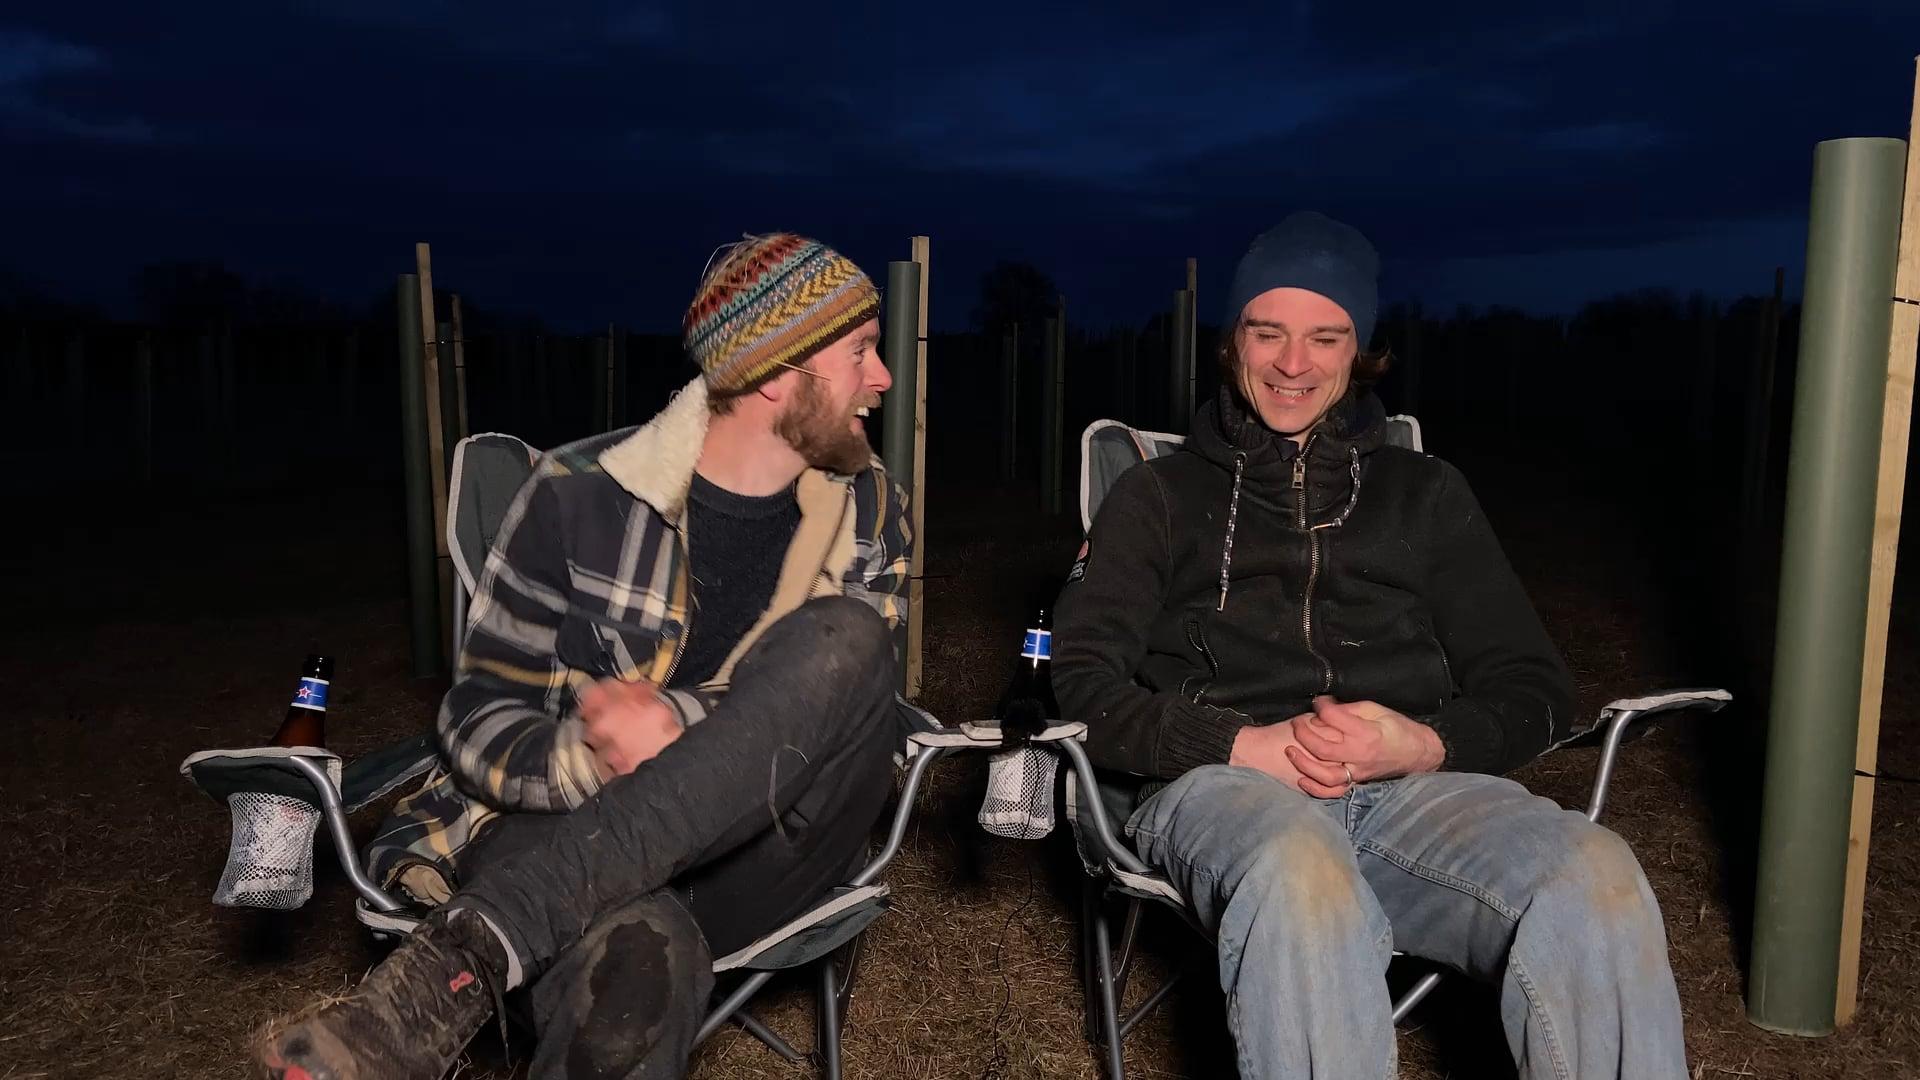 Ninebarrow Woodland Update - Friday 5th March